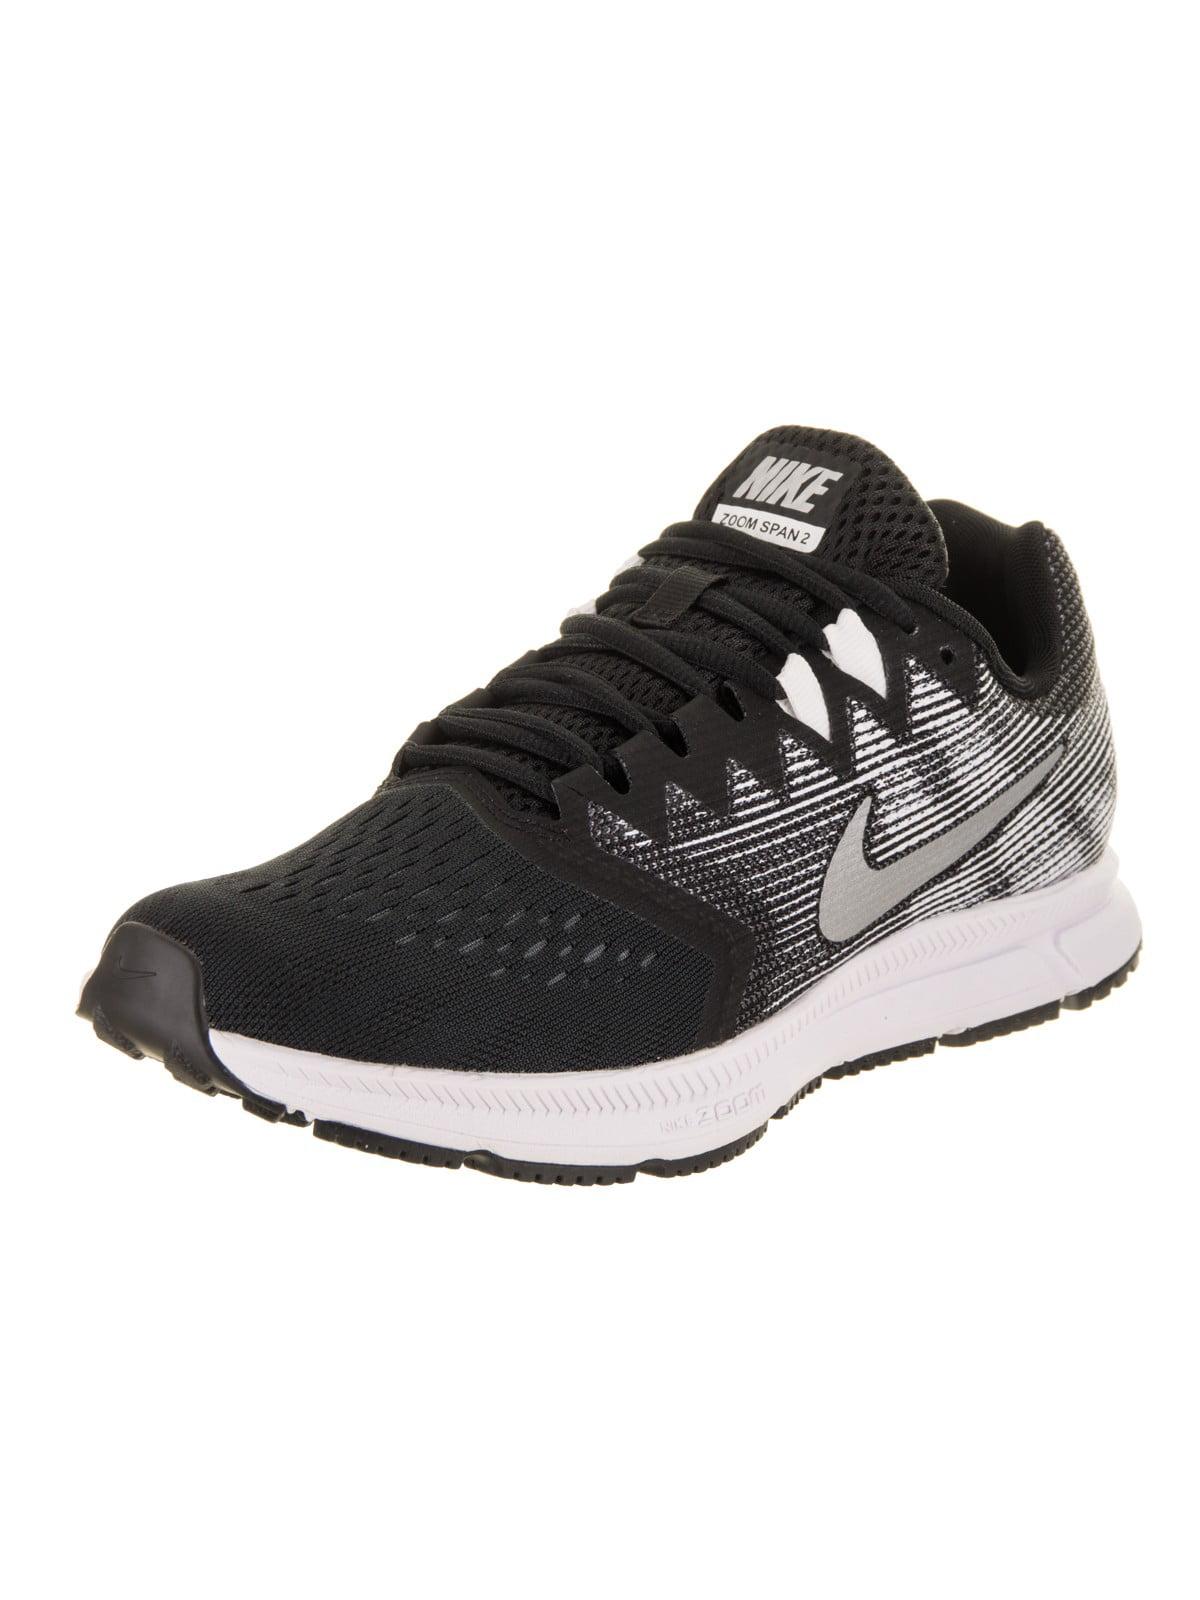 Nike Women's Zoom Span 2 Running Shoe